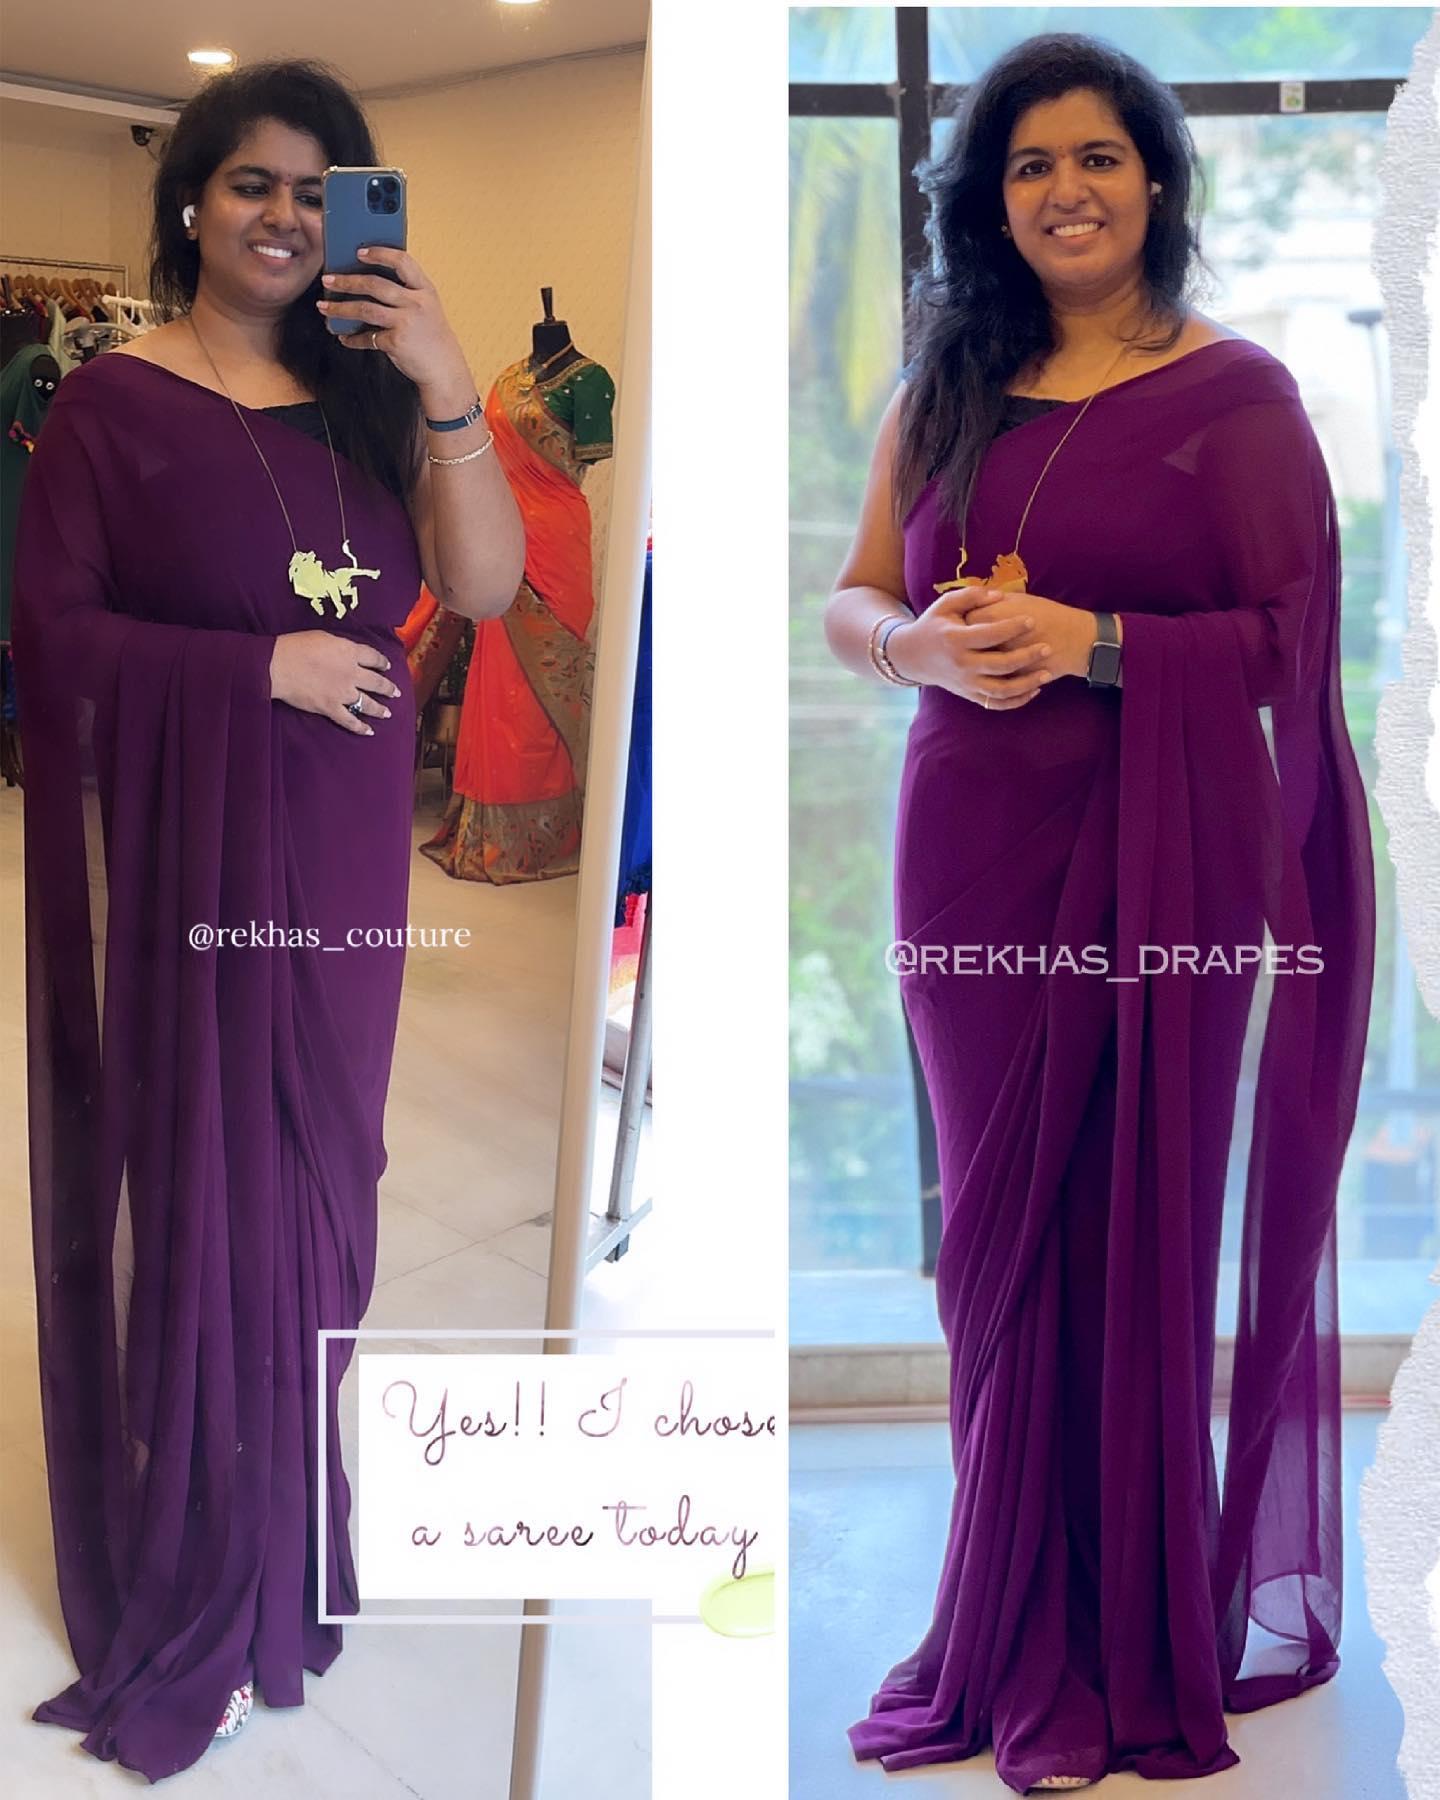 Plain georgette saree paired with black velvet off shoulder patterned blouse and lion pendant chain  D.M. for details